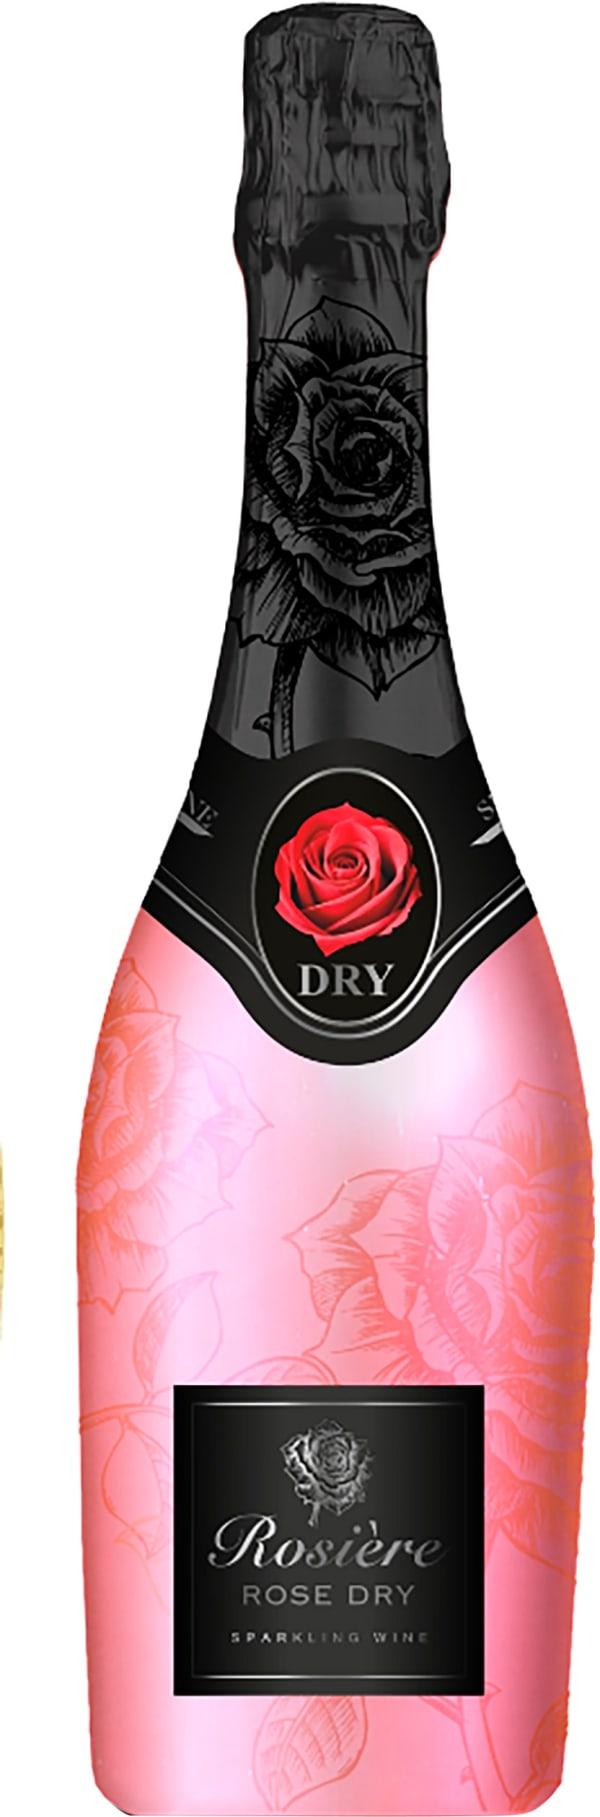 Rosiere Rose Dry